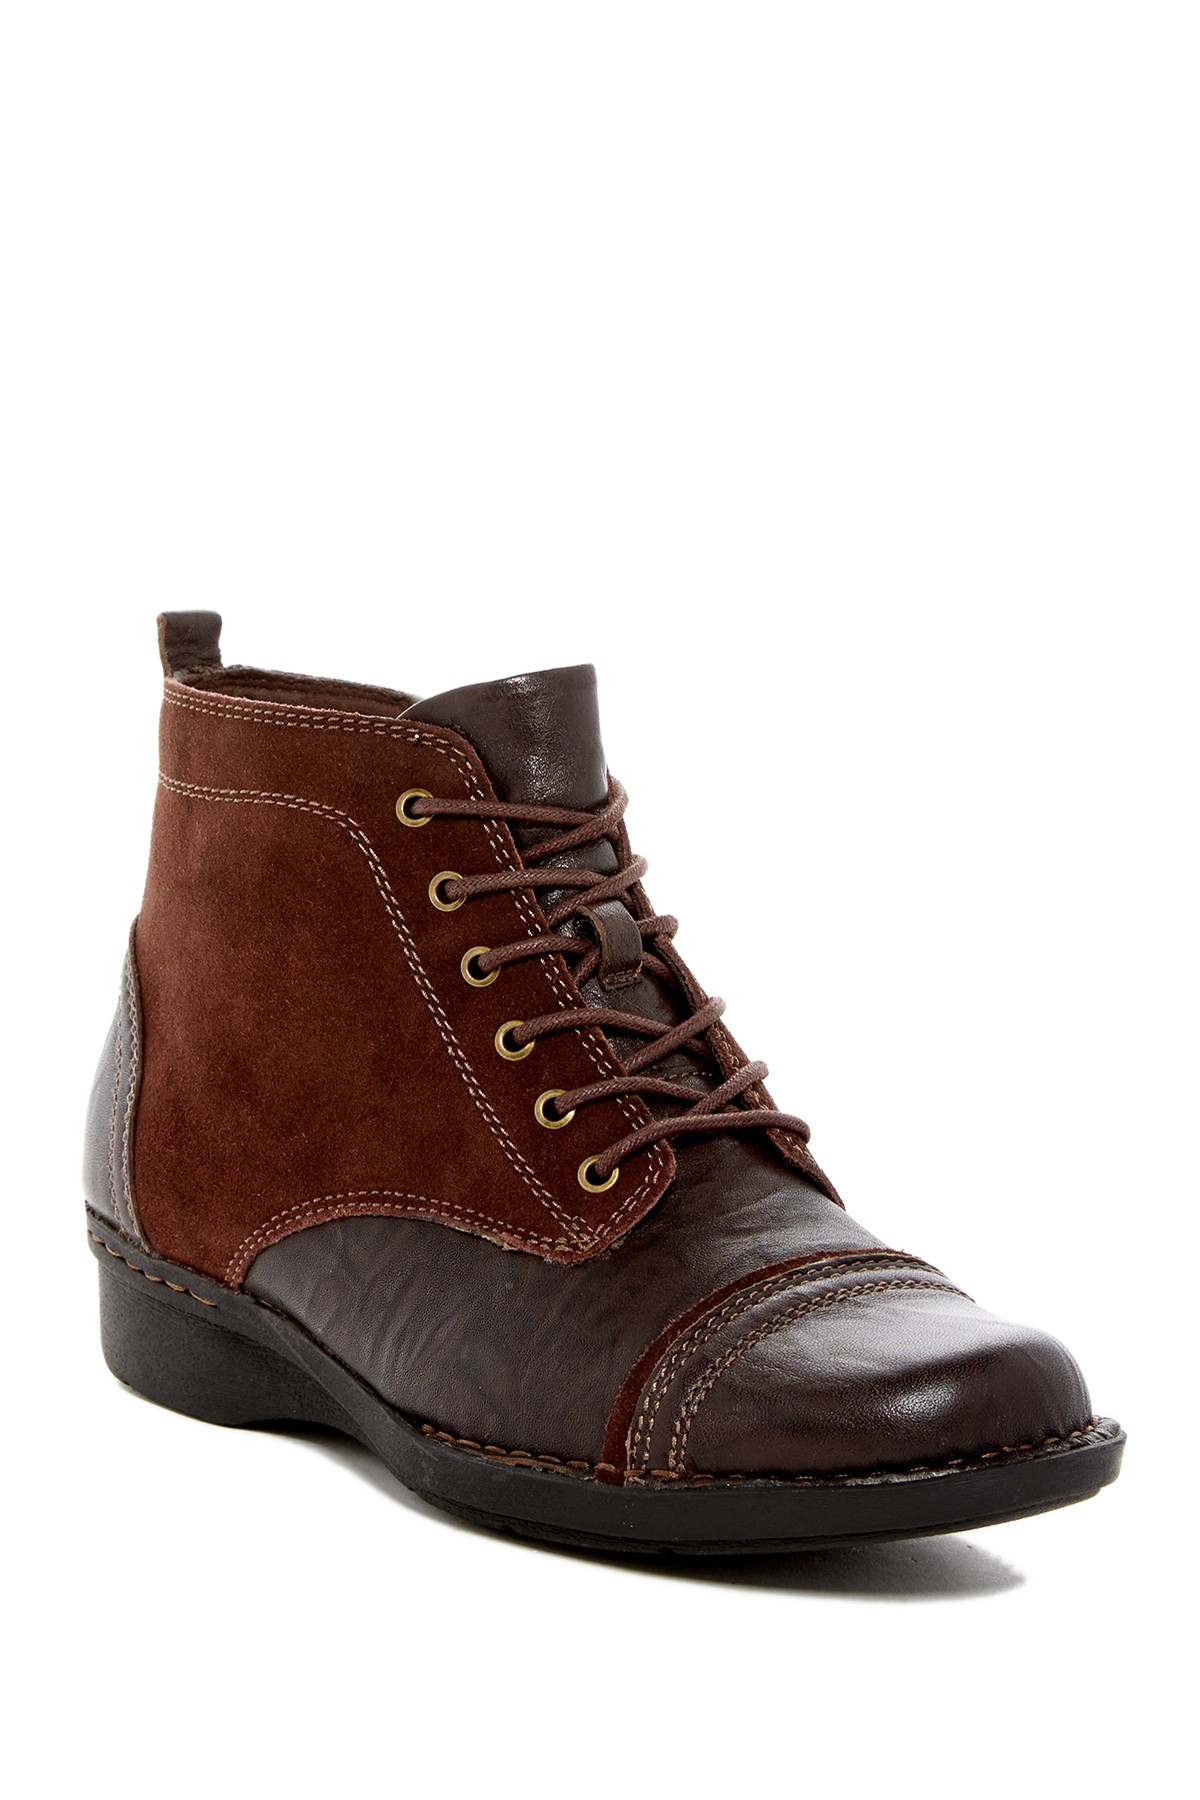 Clarks Shoes Width H